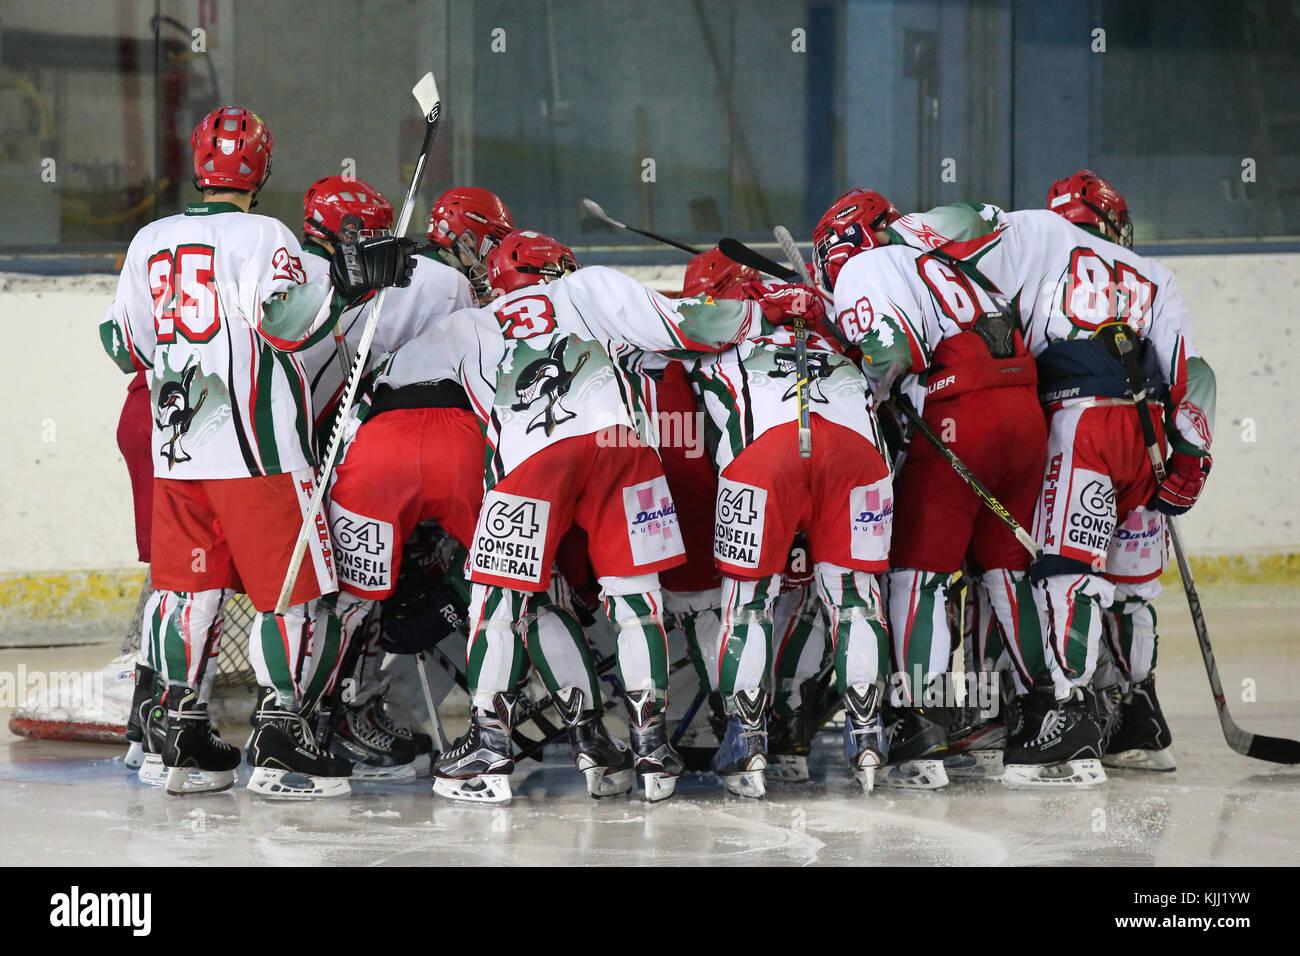 Coincidencia de hockey sobre hielo. Francia. Imagen De Stock